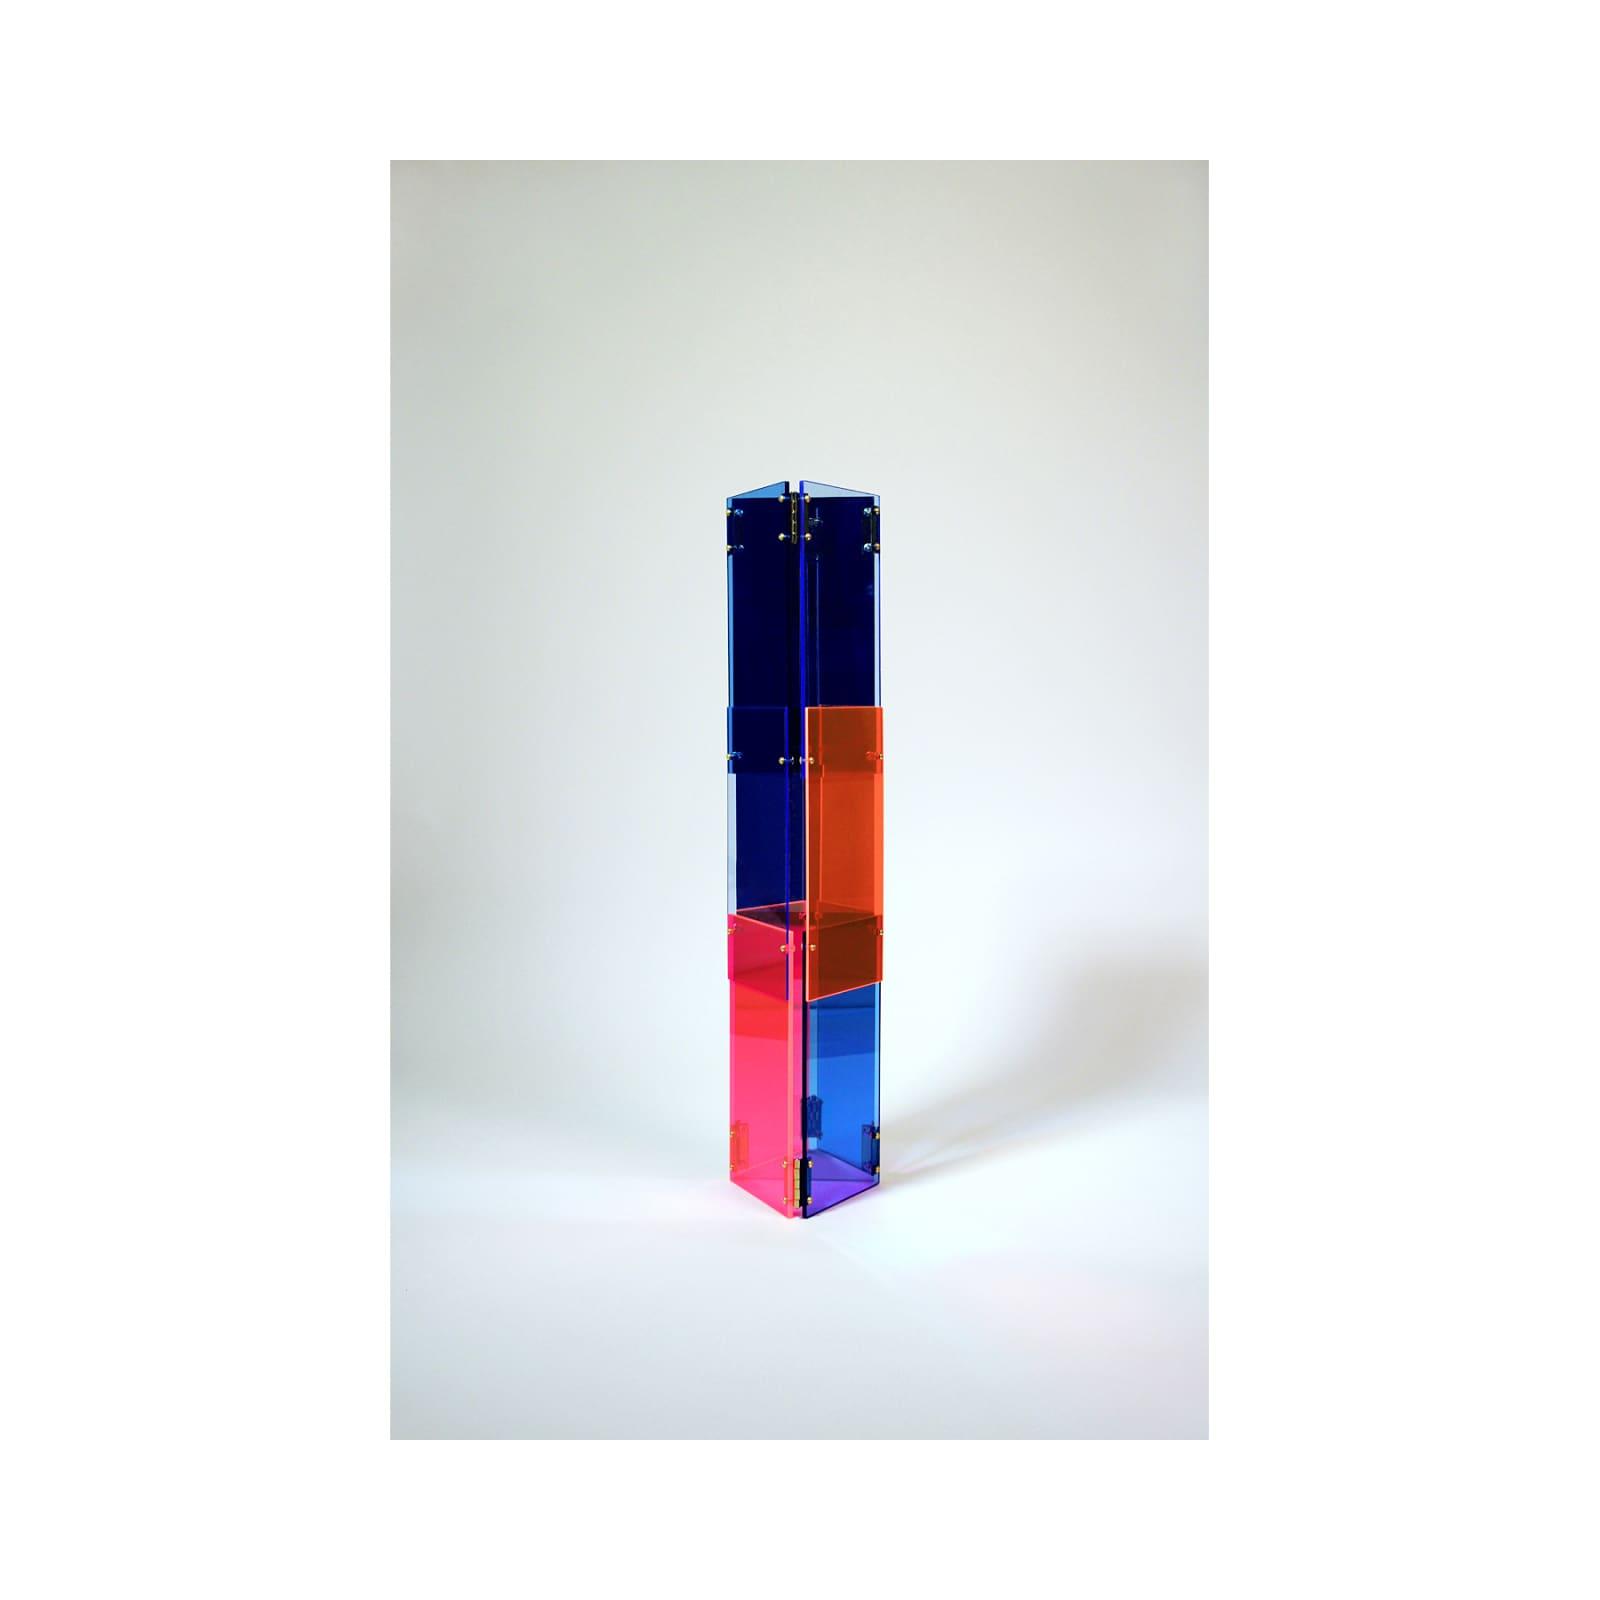 Anne Katrine Senstad  Babel 03, 2020  Lucite/Plexiglas, mirrors, brass door hinges, brass screws, bolts and washers  30 x 7 x 8 in  76.2 x 17.8 x 20.3 cm  Series: Circle of Babel